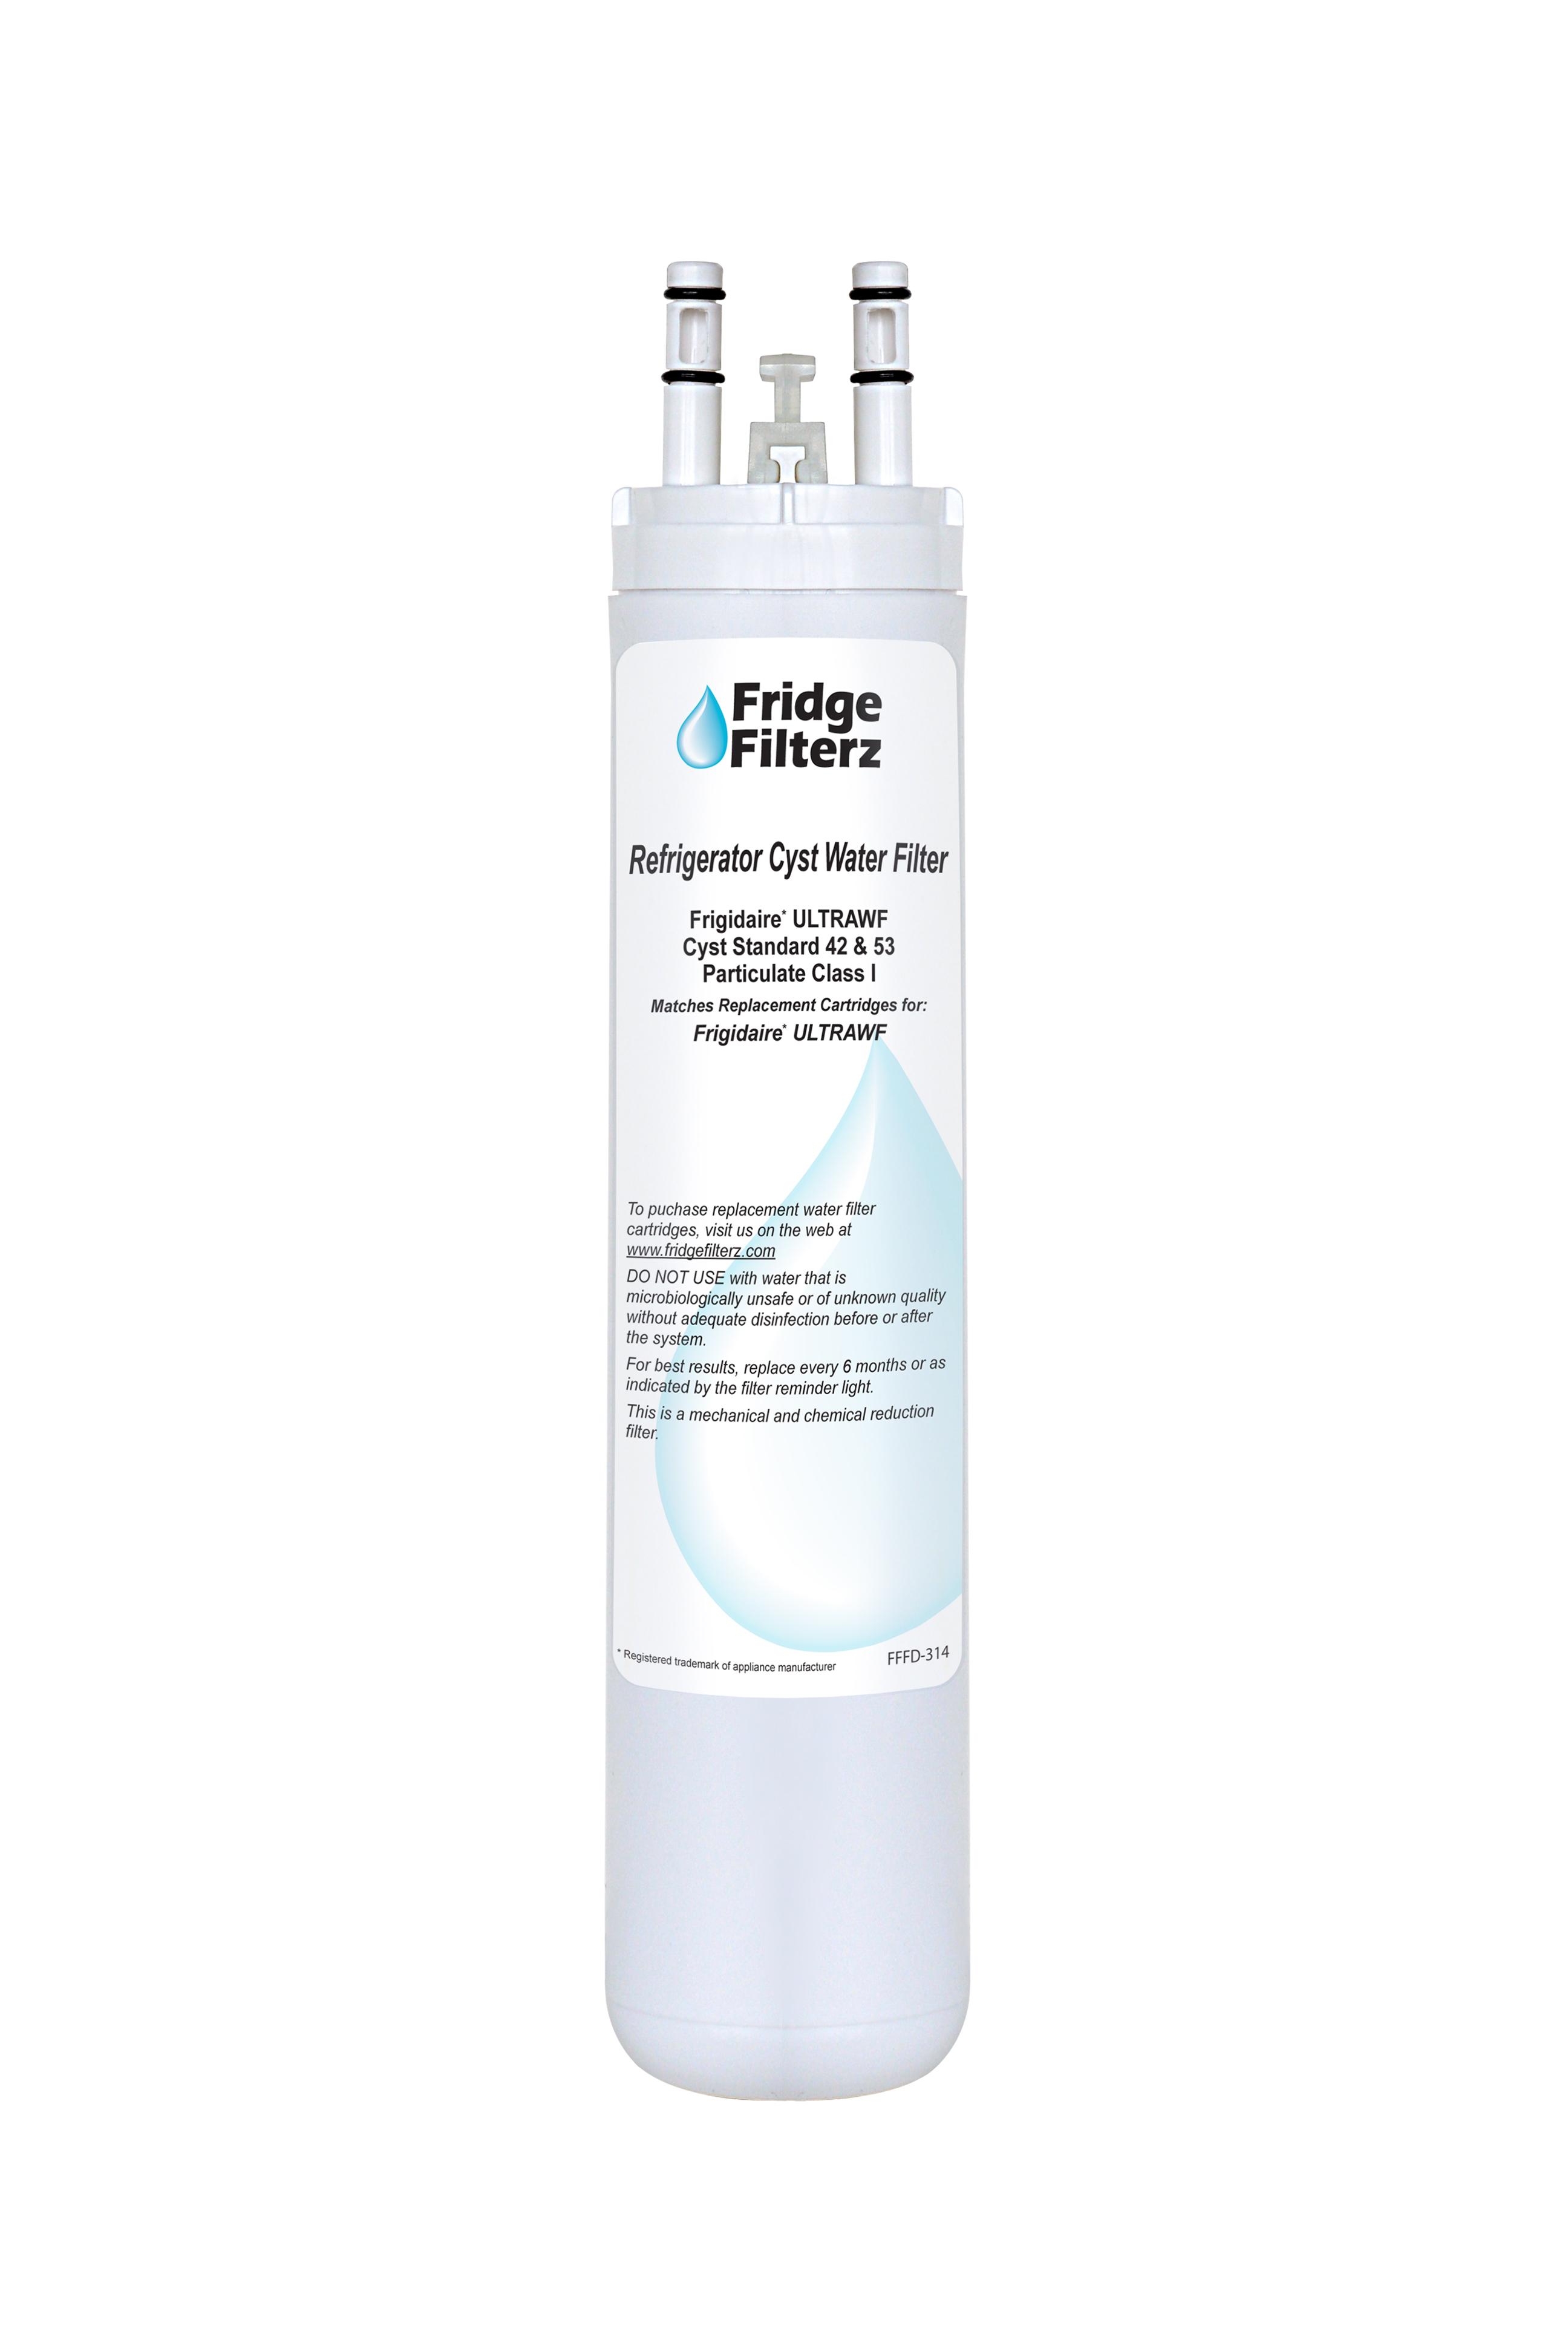 FridgeFilterz Refrigerator Water Filter for Frigidaire